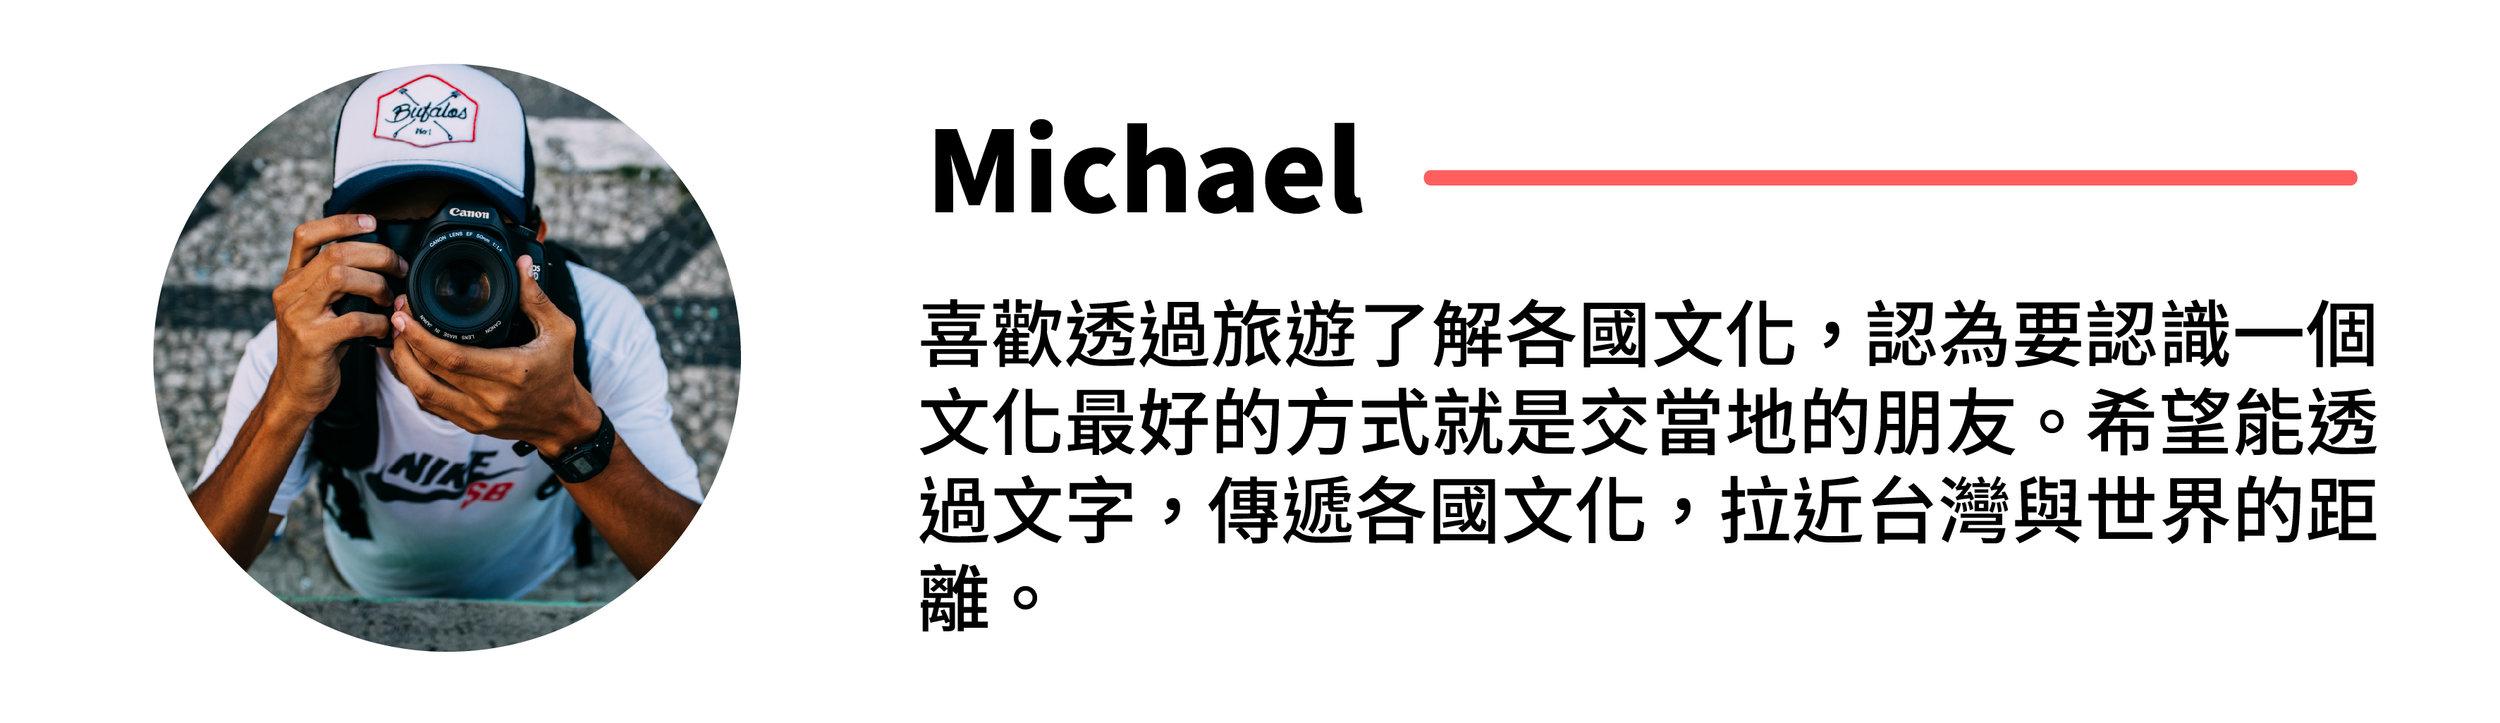 michael_blog.jpg